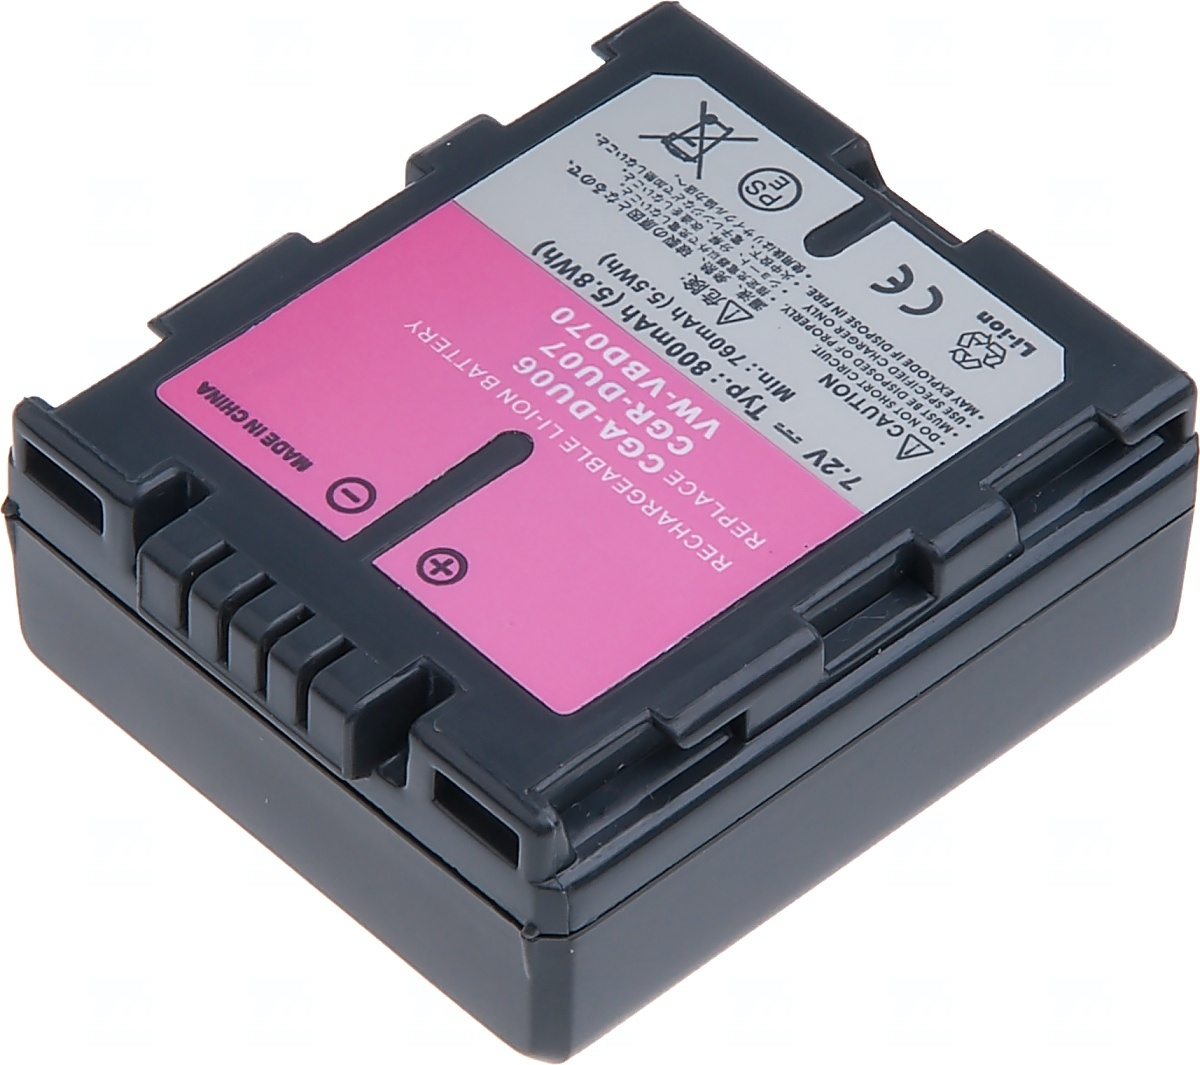 Baterie T6 power Panasonic VW-VBD070, CGA-DU07, CGR-DU07, Hitachi DZ-BP07S, 800mAh, šedá (Baterie a gripy)